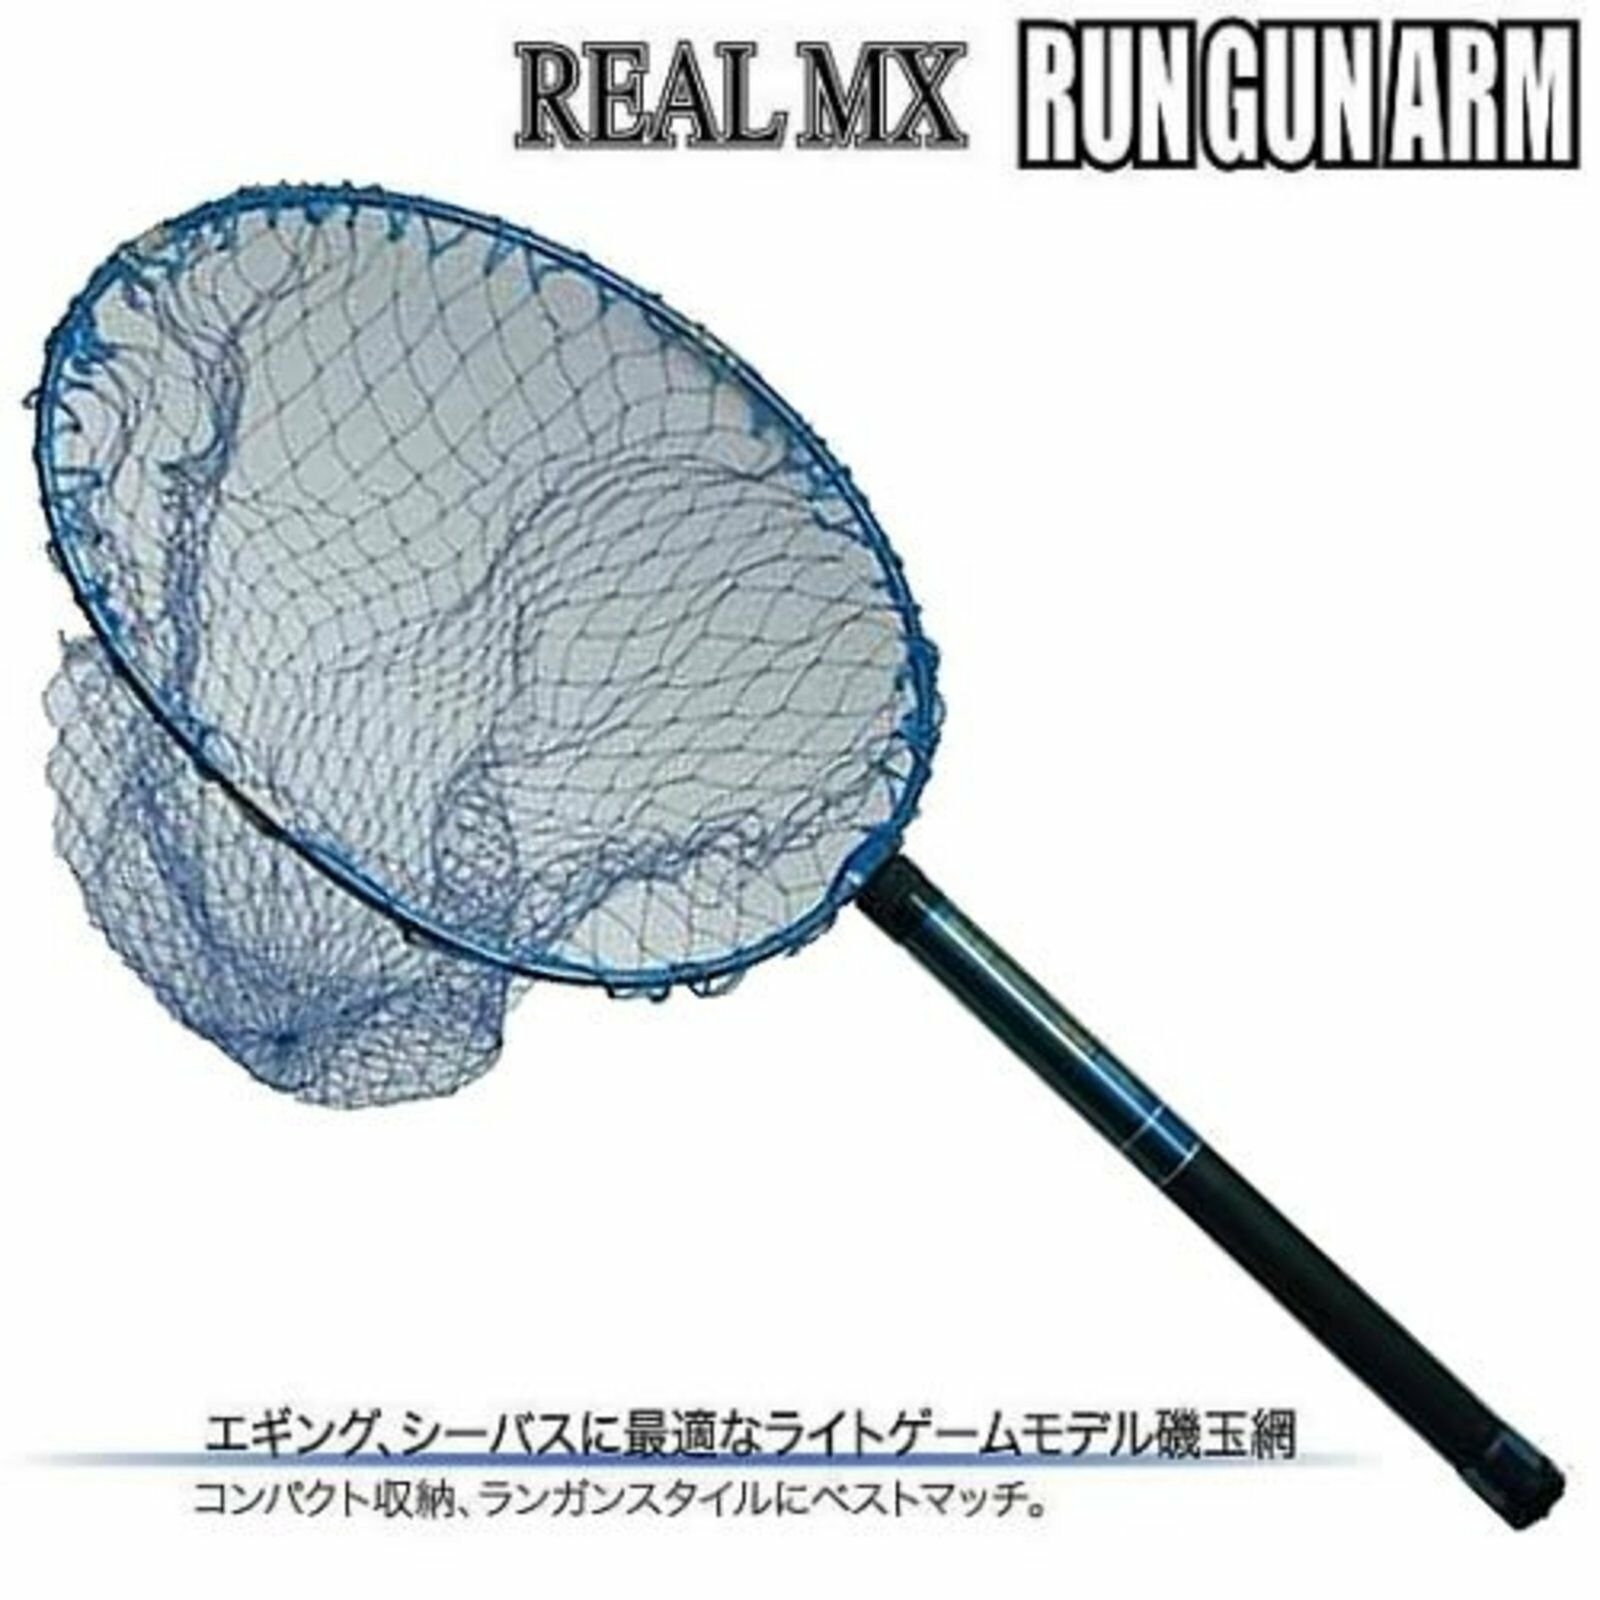 PRO TRUST RUN GUN ARM bluee 300 270cm Telescopic fishing carrying landing net F S